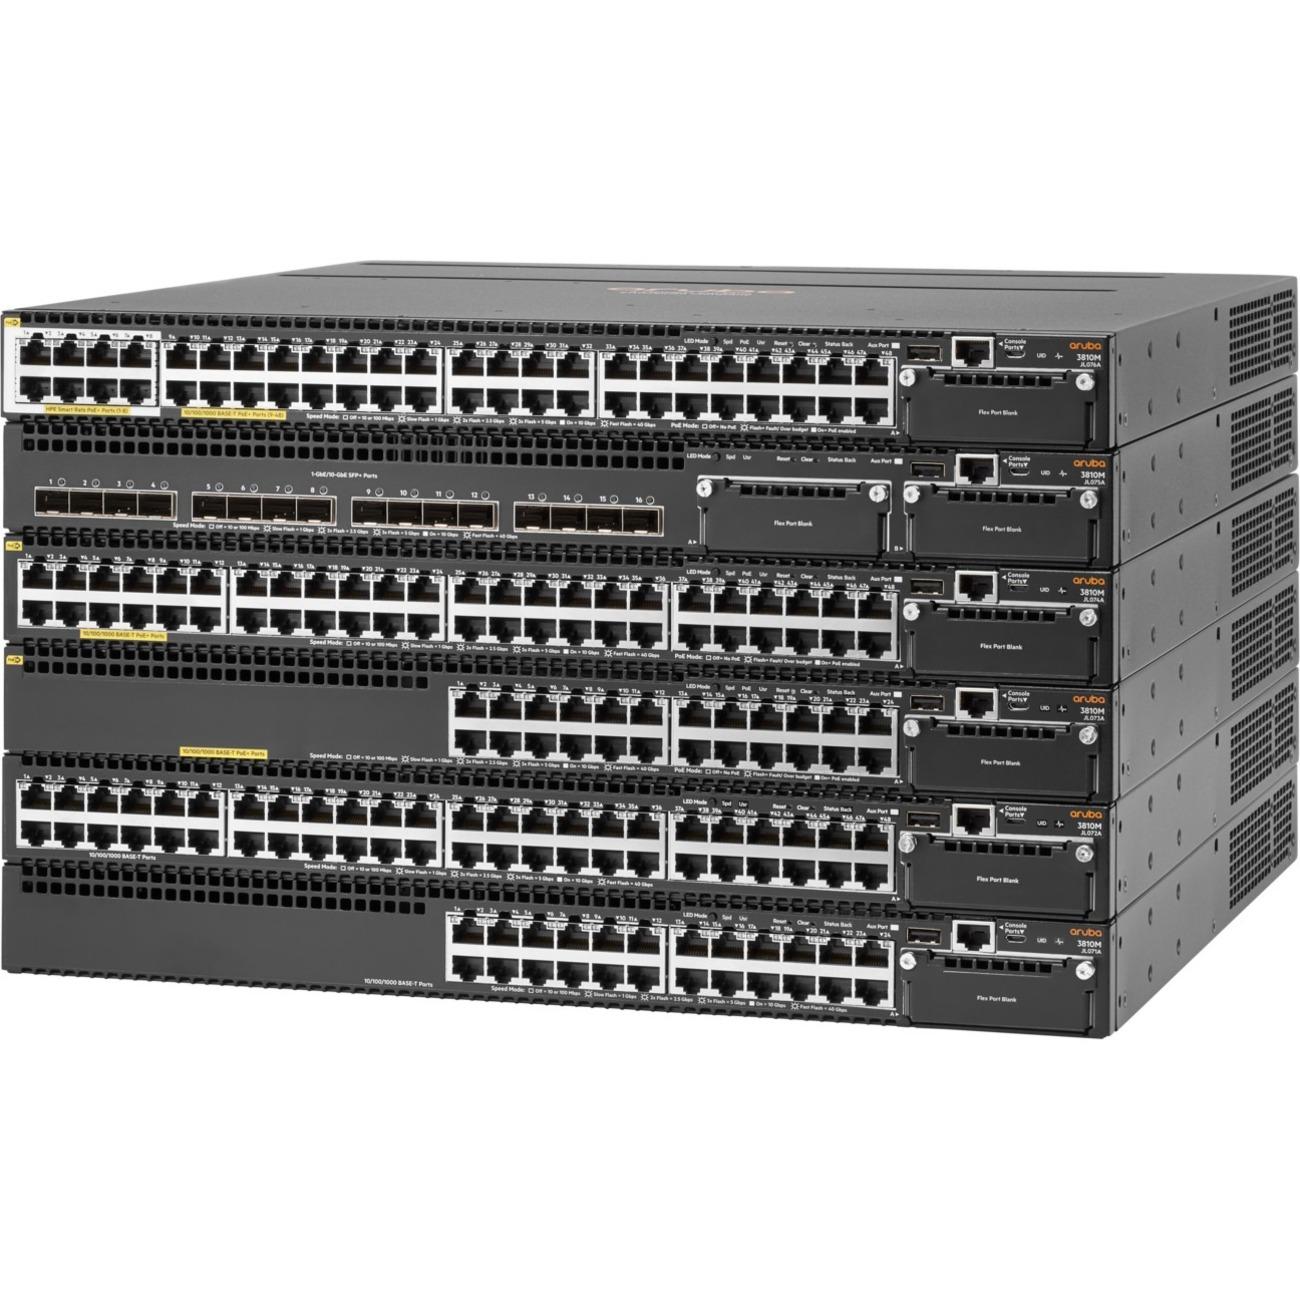 HP JL086A X372 54VDC 680W PS 680 Power Supply JL086A#ABA